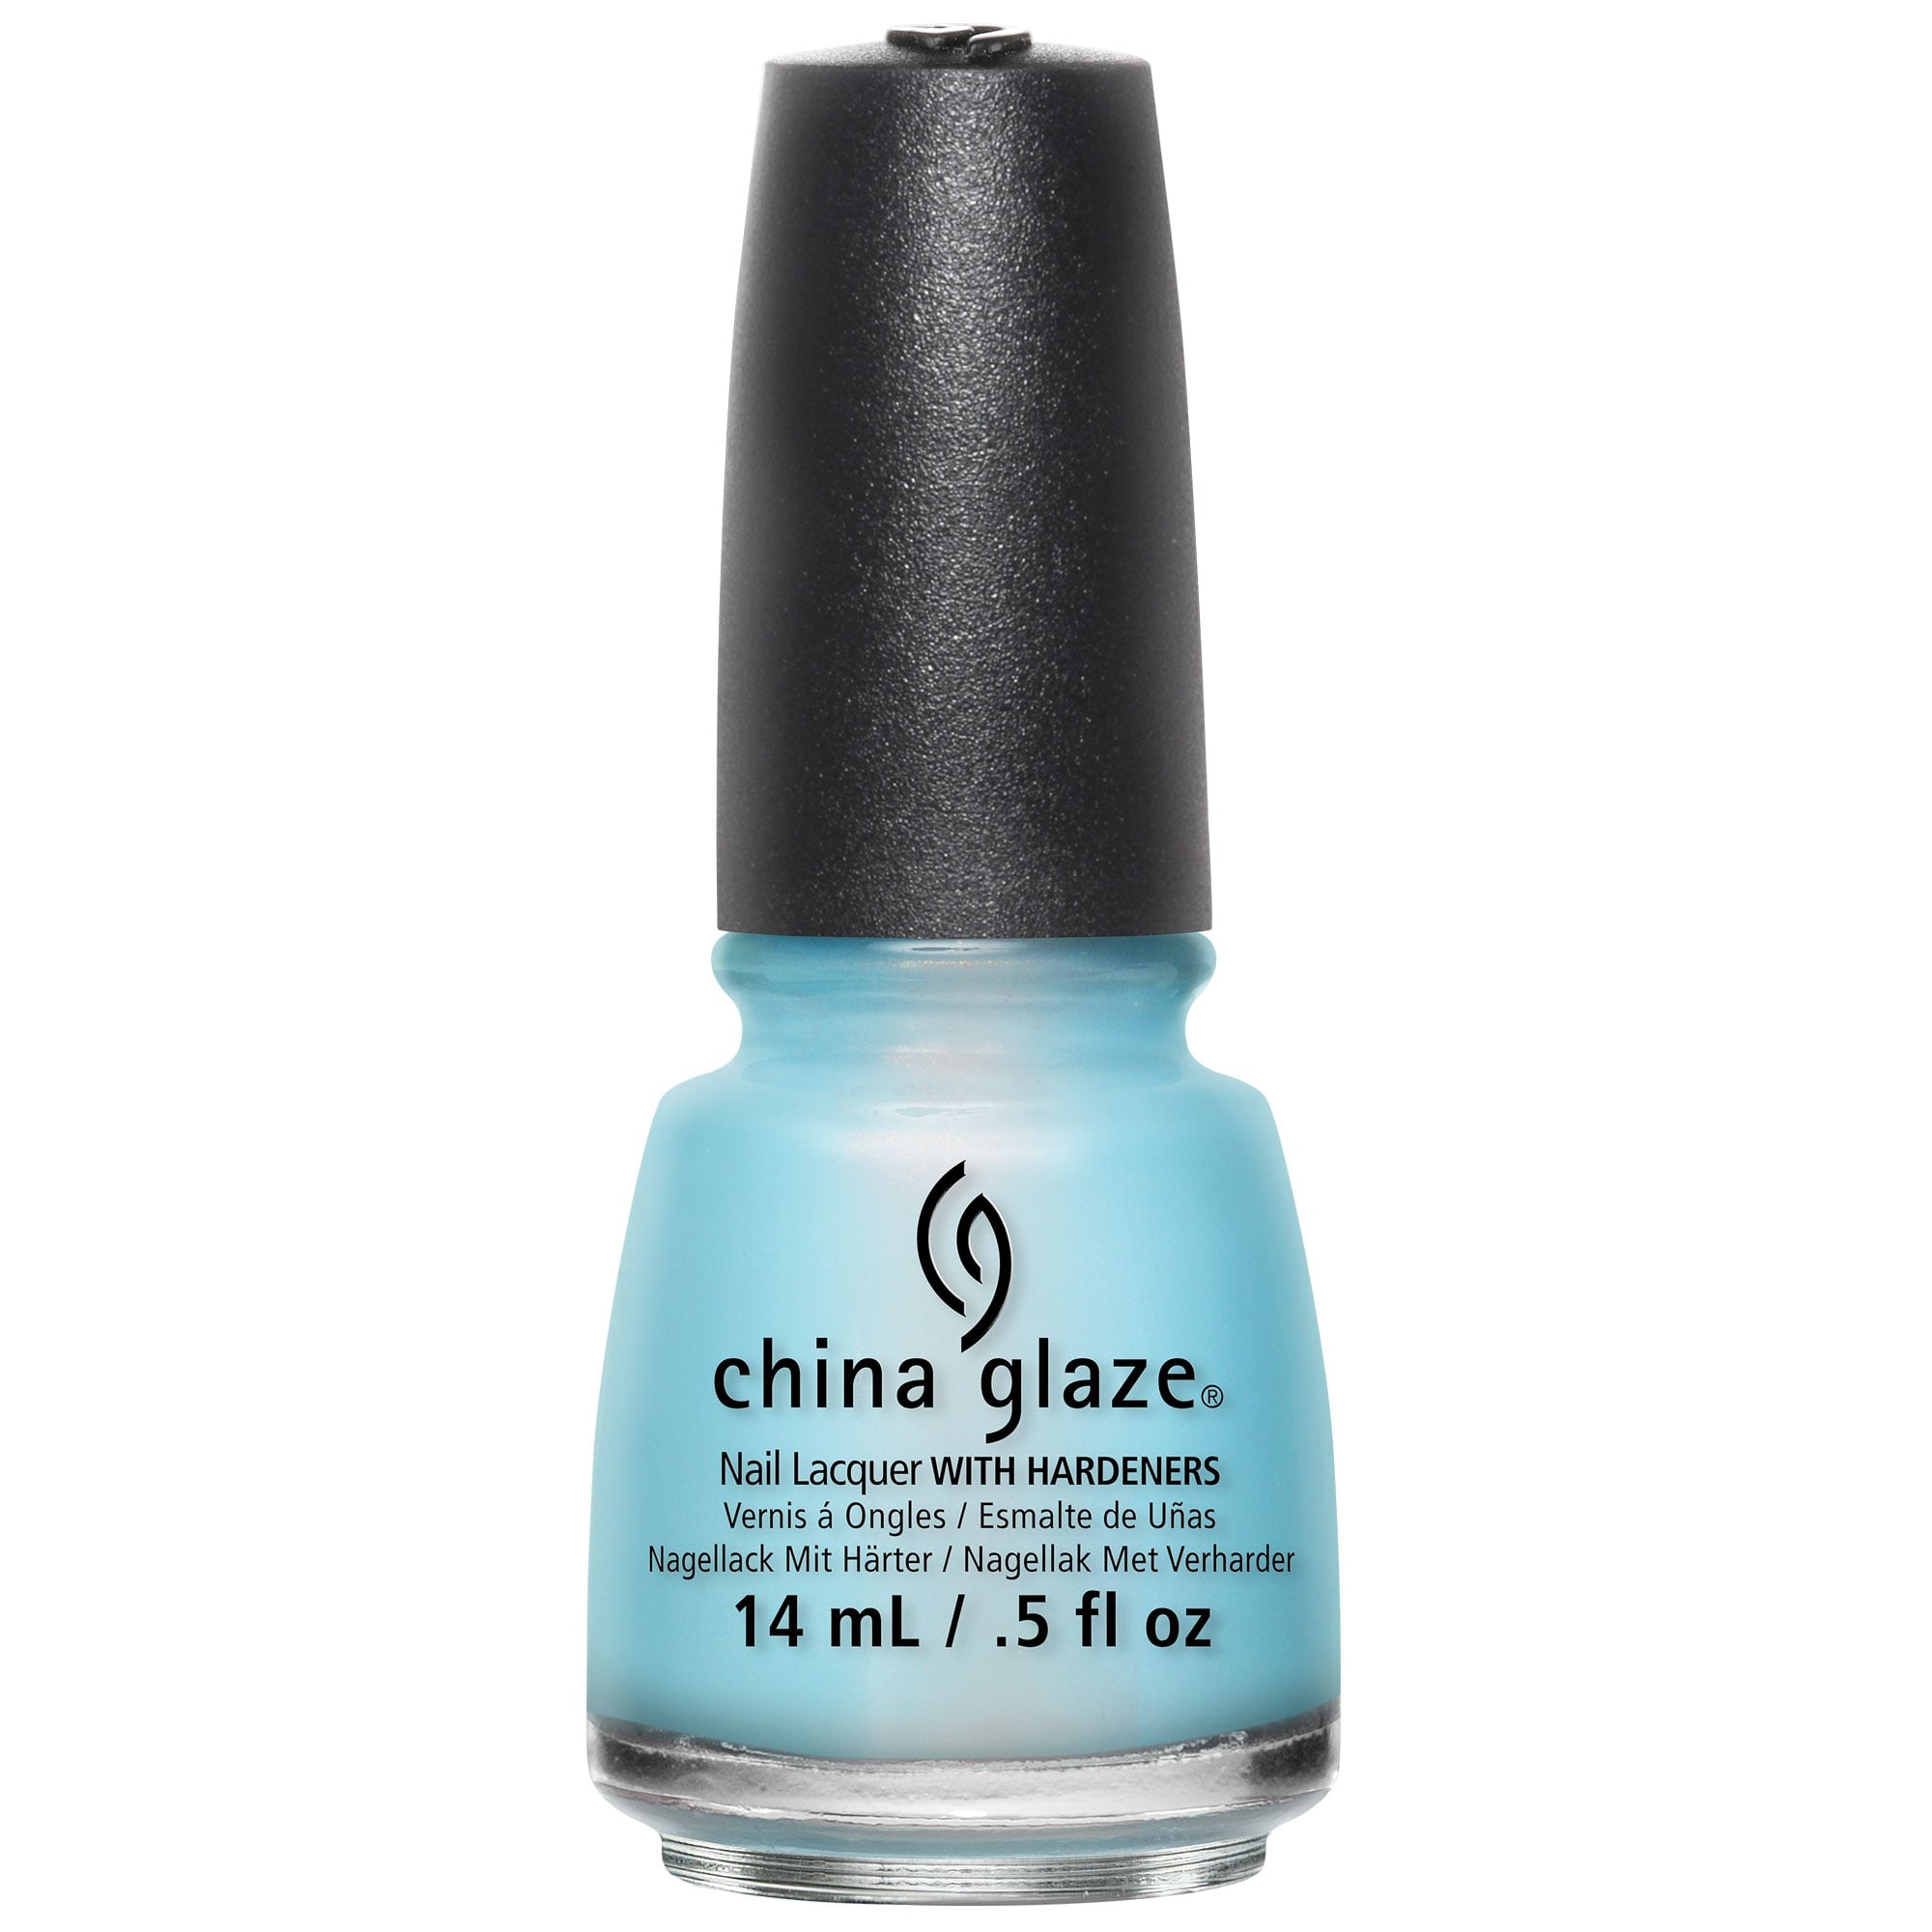 china glaze 2015 nail polish collection road trip